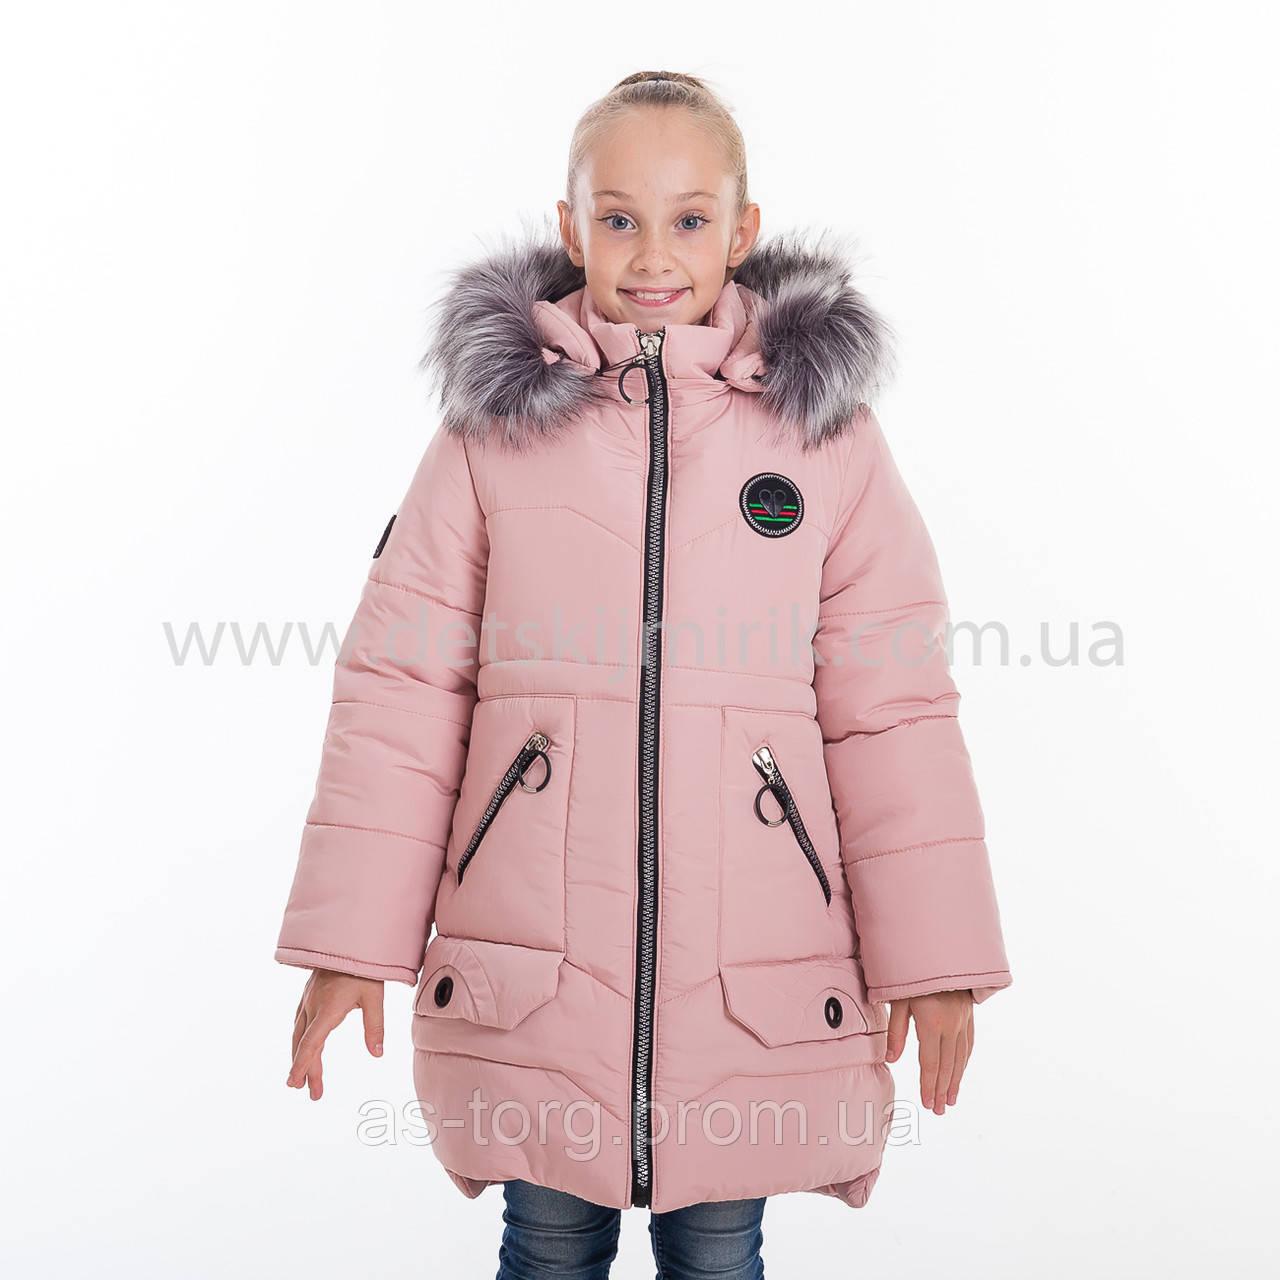 "Зимняя куртка для девочки "" Анна"", Зима 2019 года"